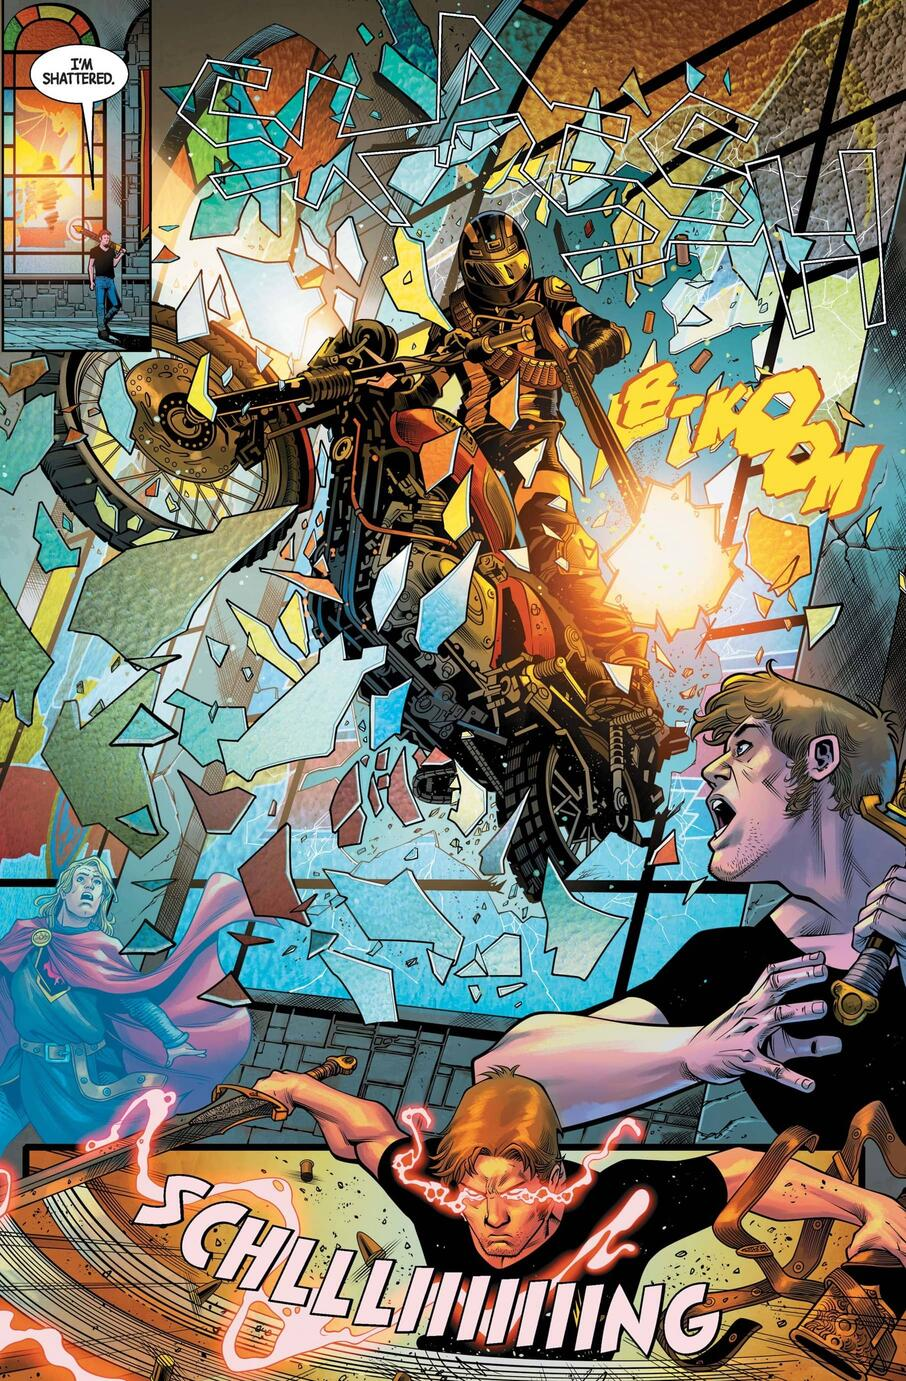 Dane Whitman faces an interruption in BLACK KNIGHT: CURSE OF THE EBONY BLADE (2021) #2.